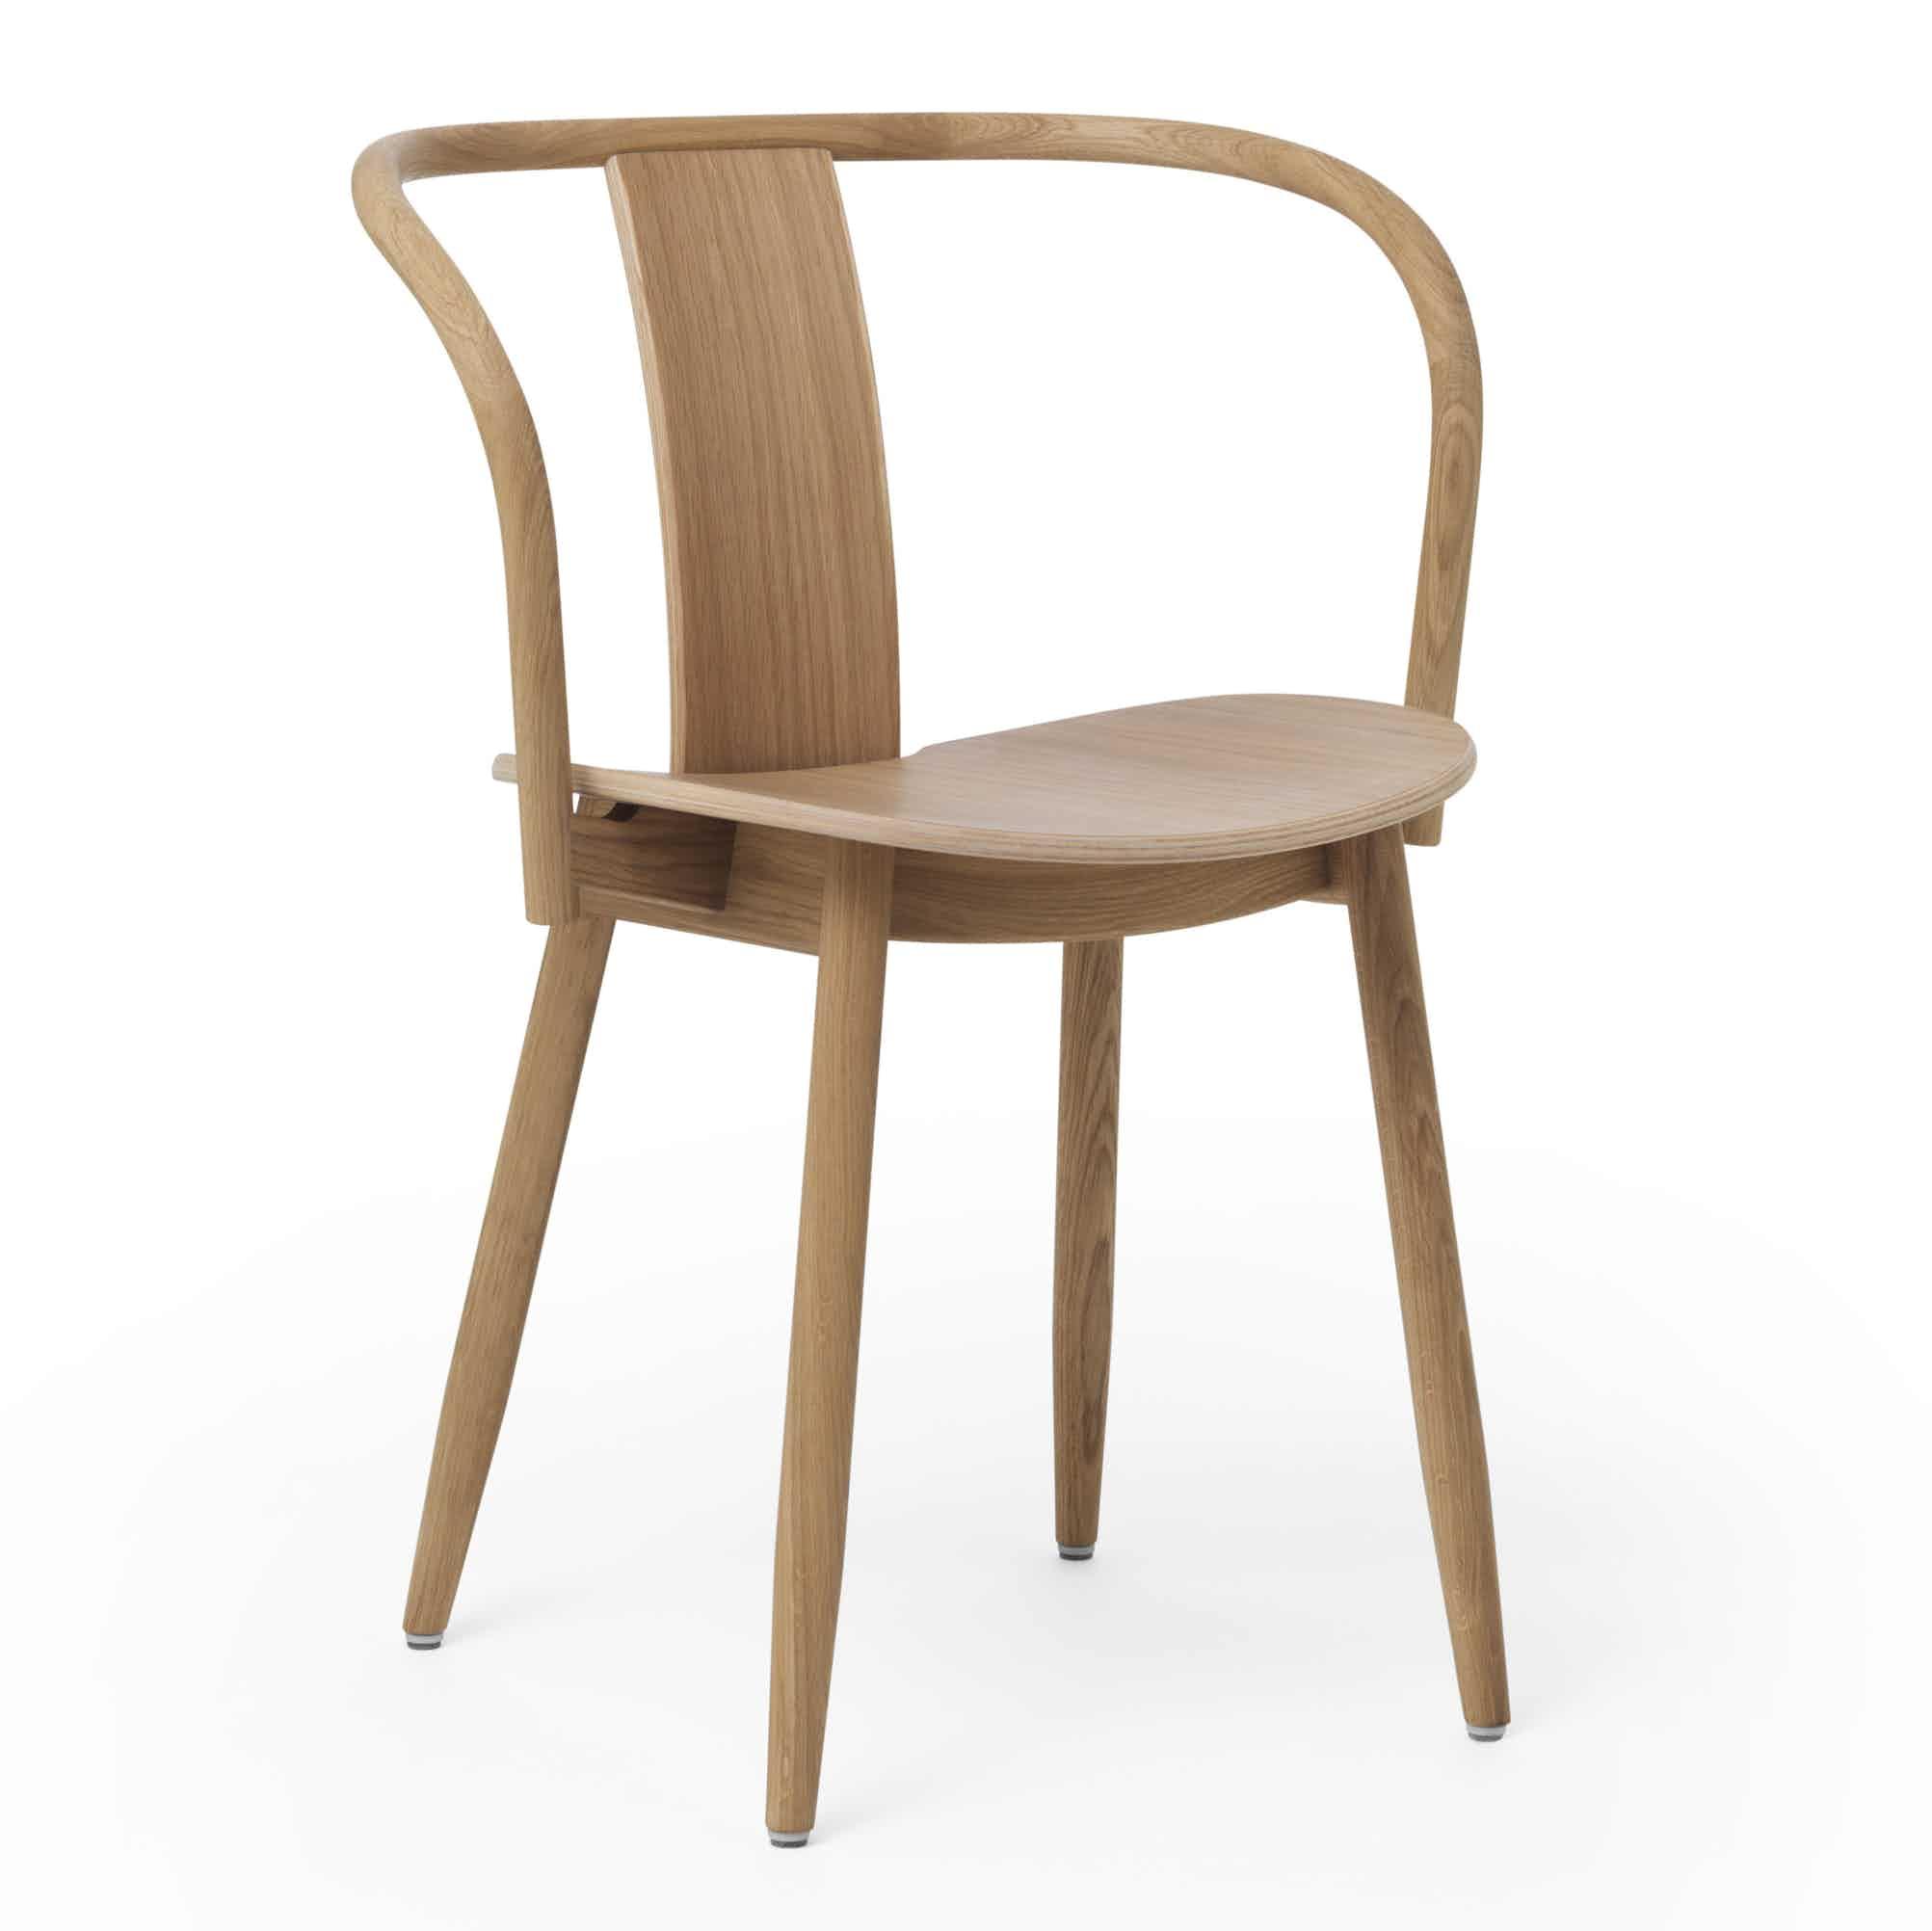 Massproductions Icha Chair Brown Angle Haute Living